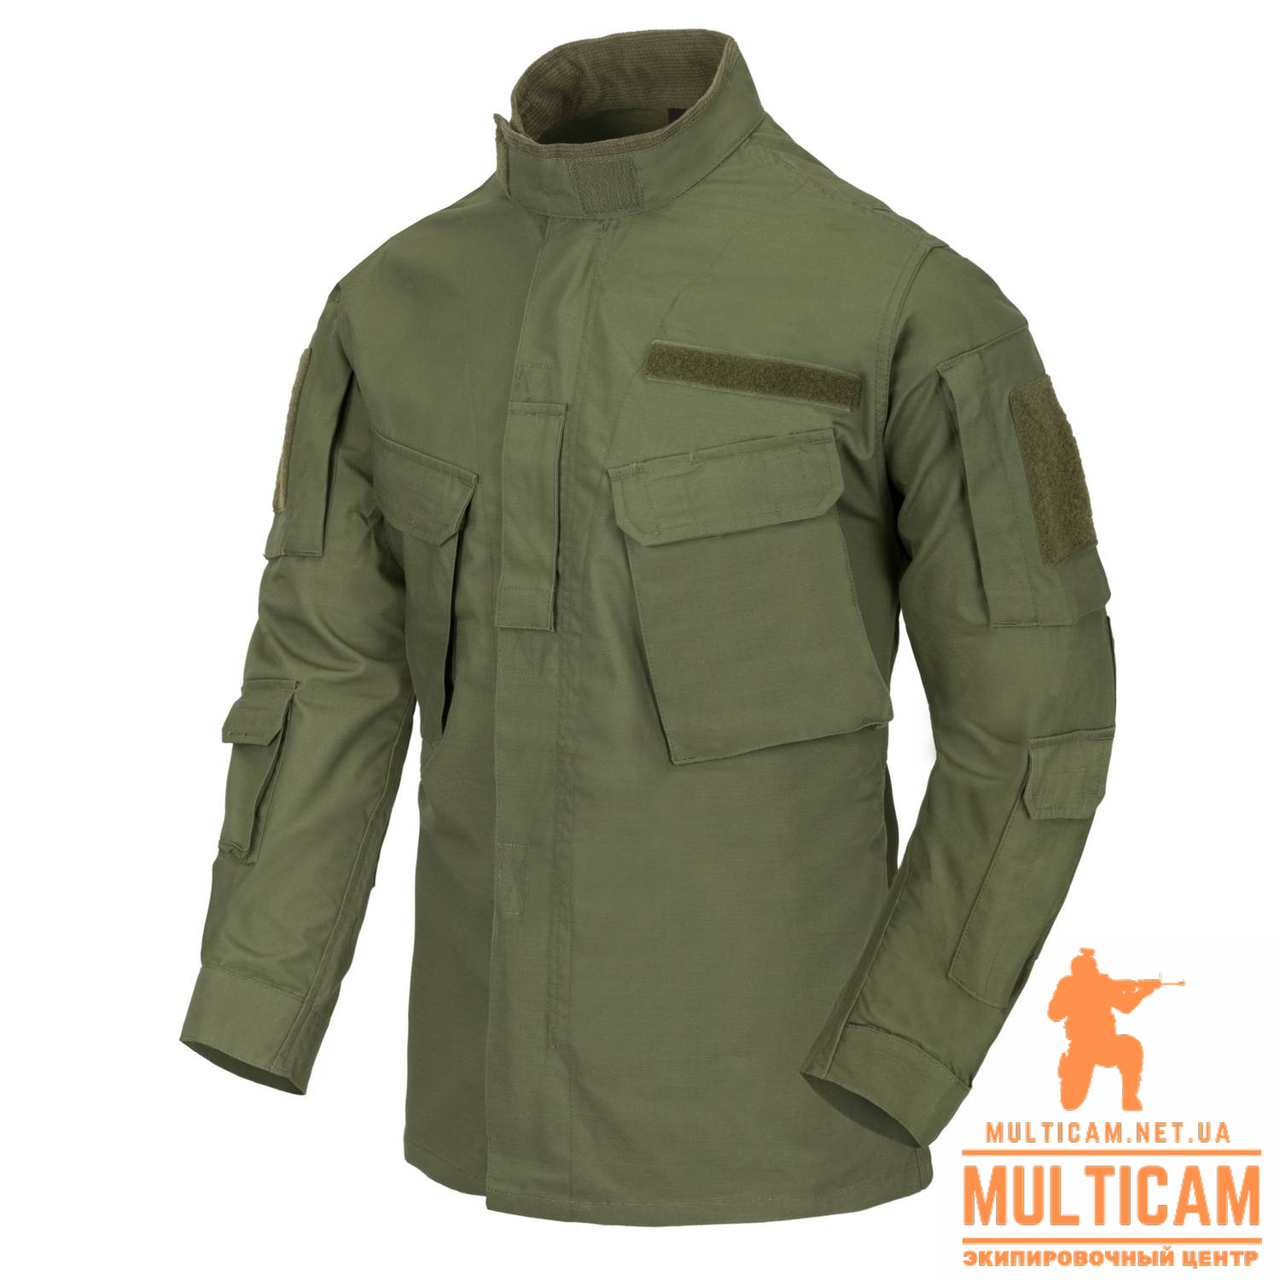 Китель Helikon-Tex® CPU® Shirt - PolyCotton Ripstop - Olive Green